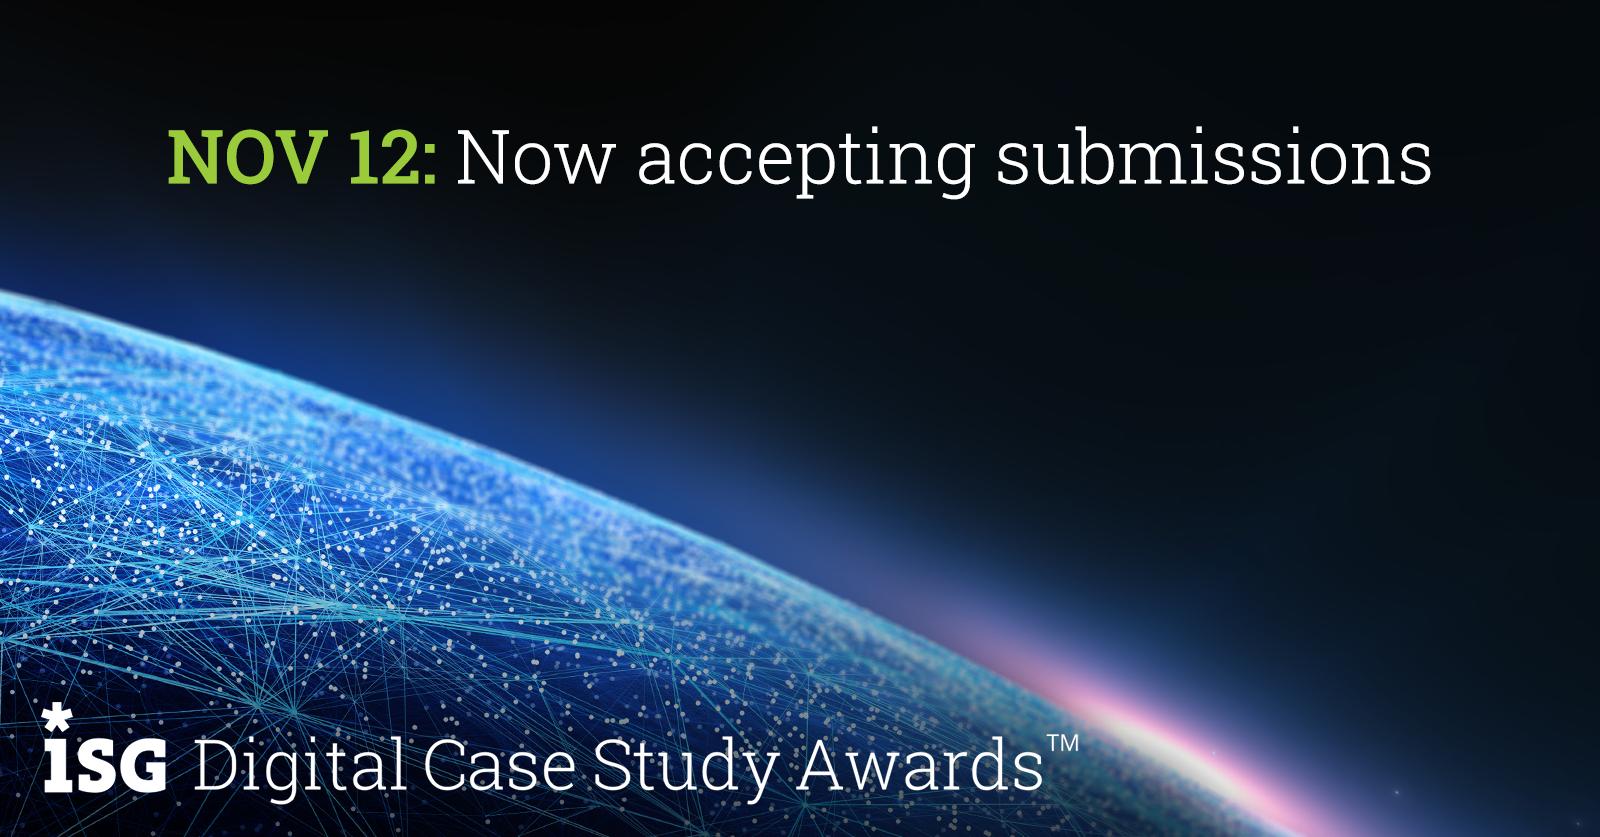 ISG DIgital Case Study Awards